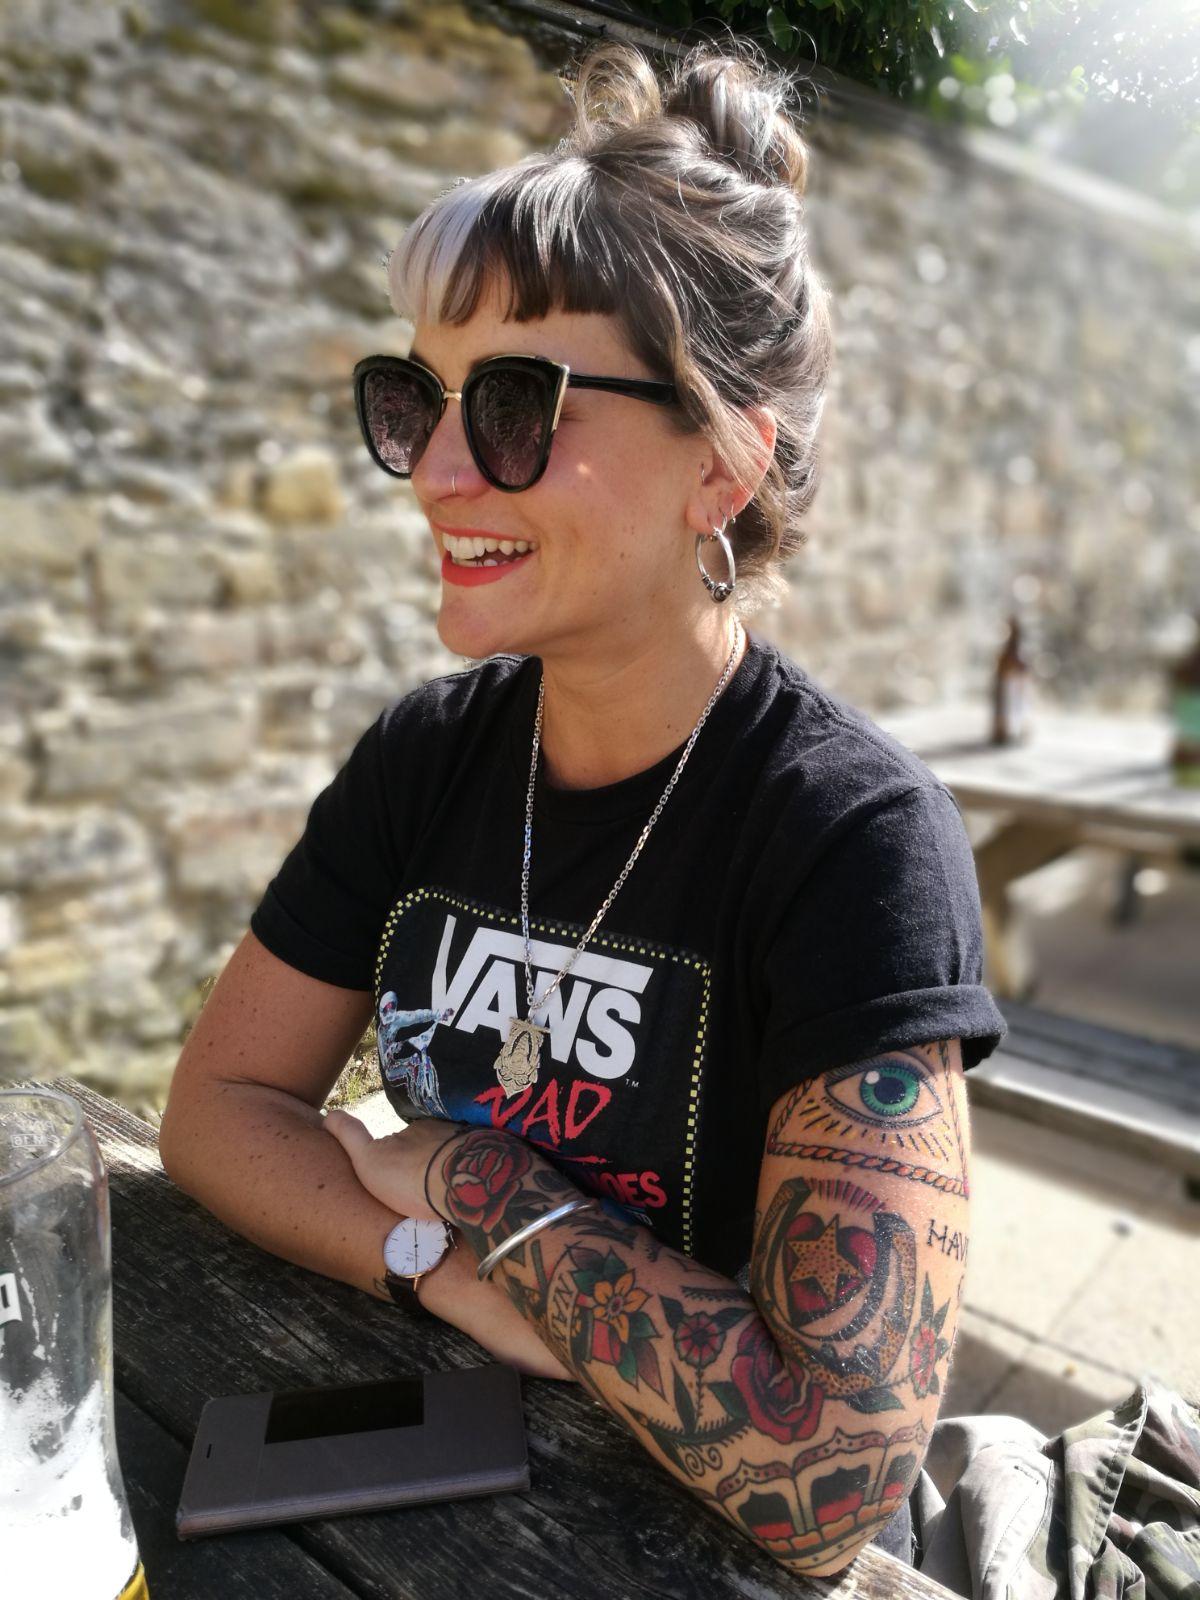 Derryth Ridge - Co-Curator Tattoo -British Tattoo Art RevealedFollow:@derryth13Visit:NMMC.CO.UK